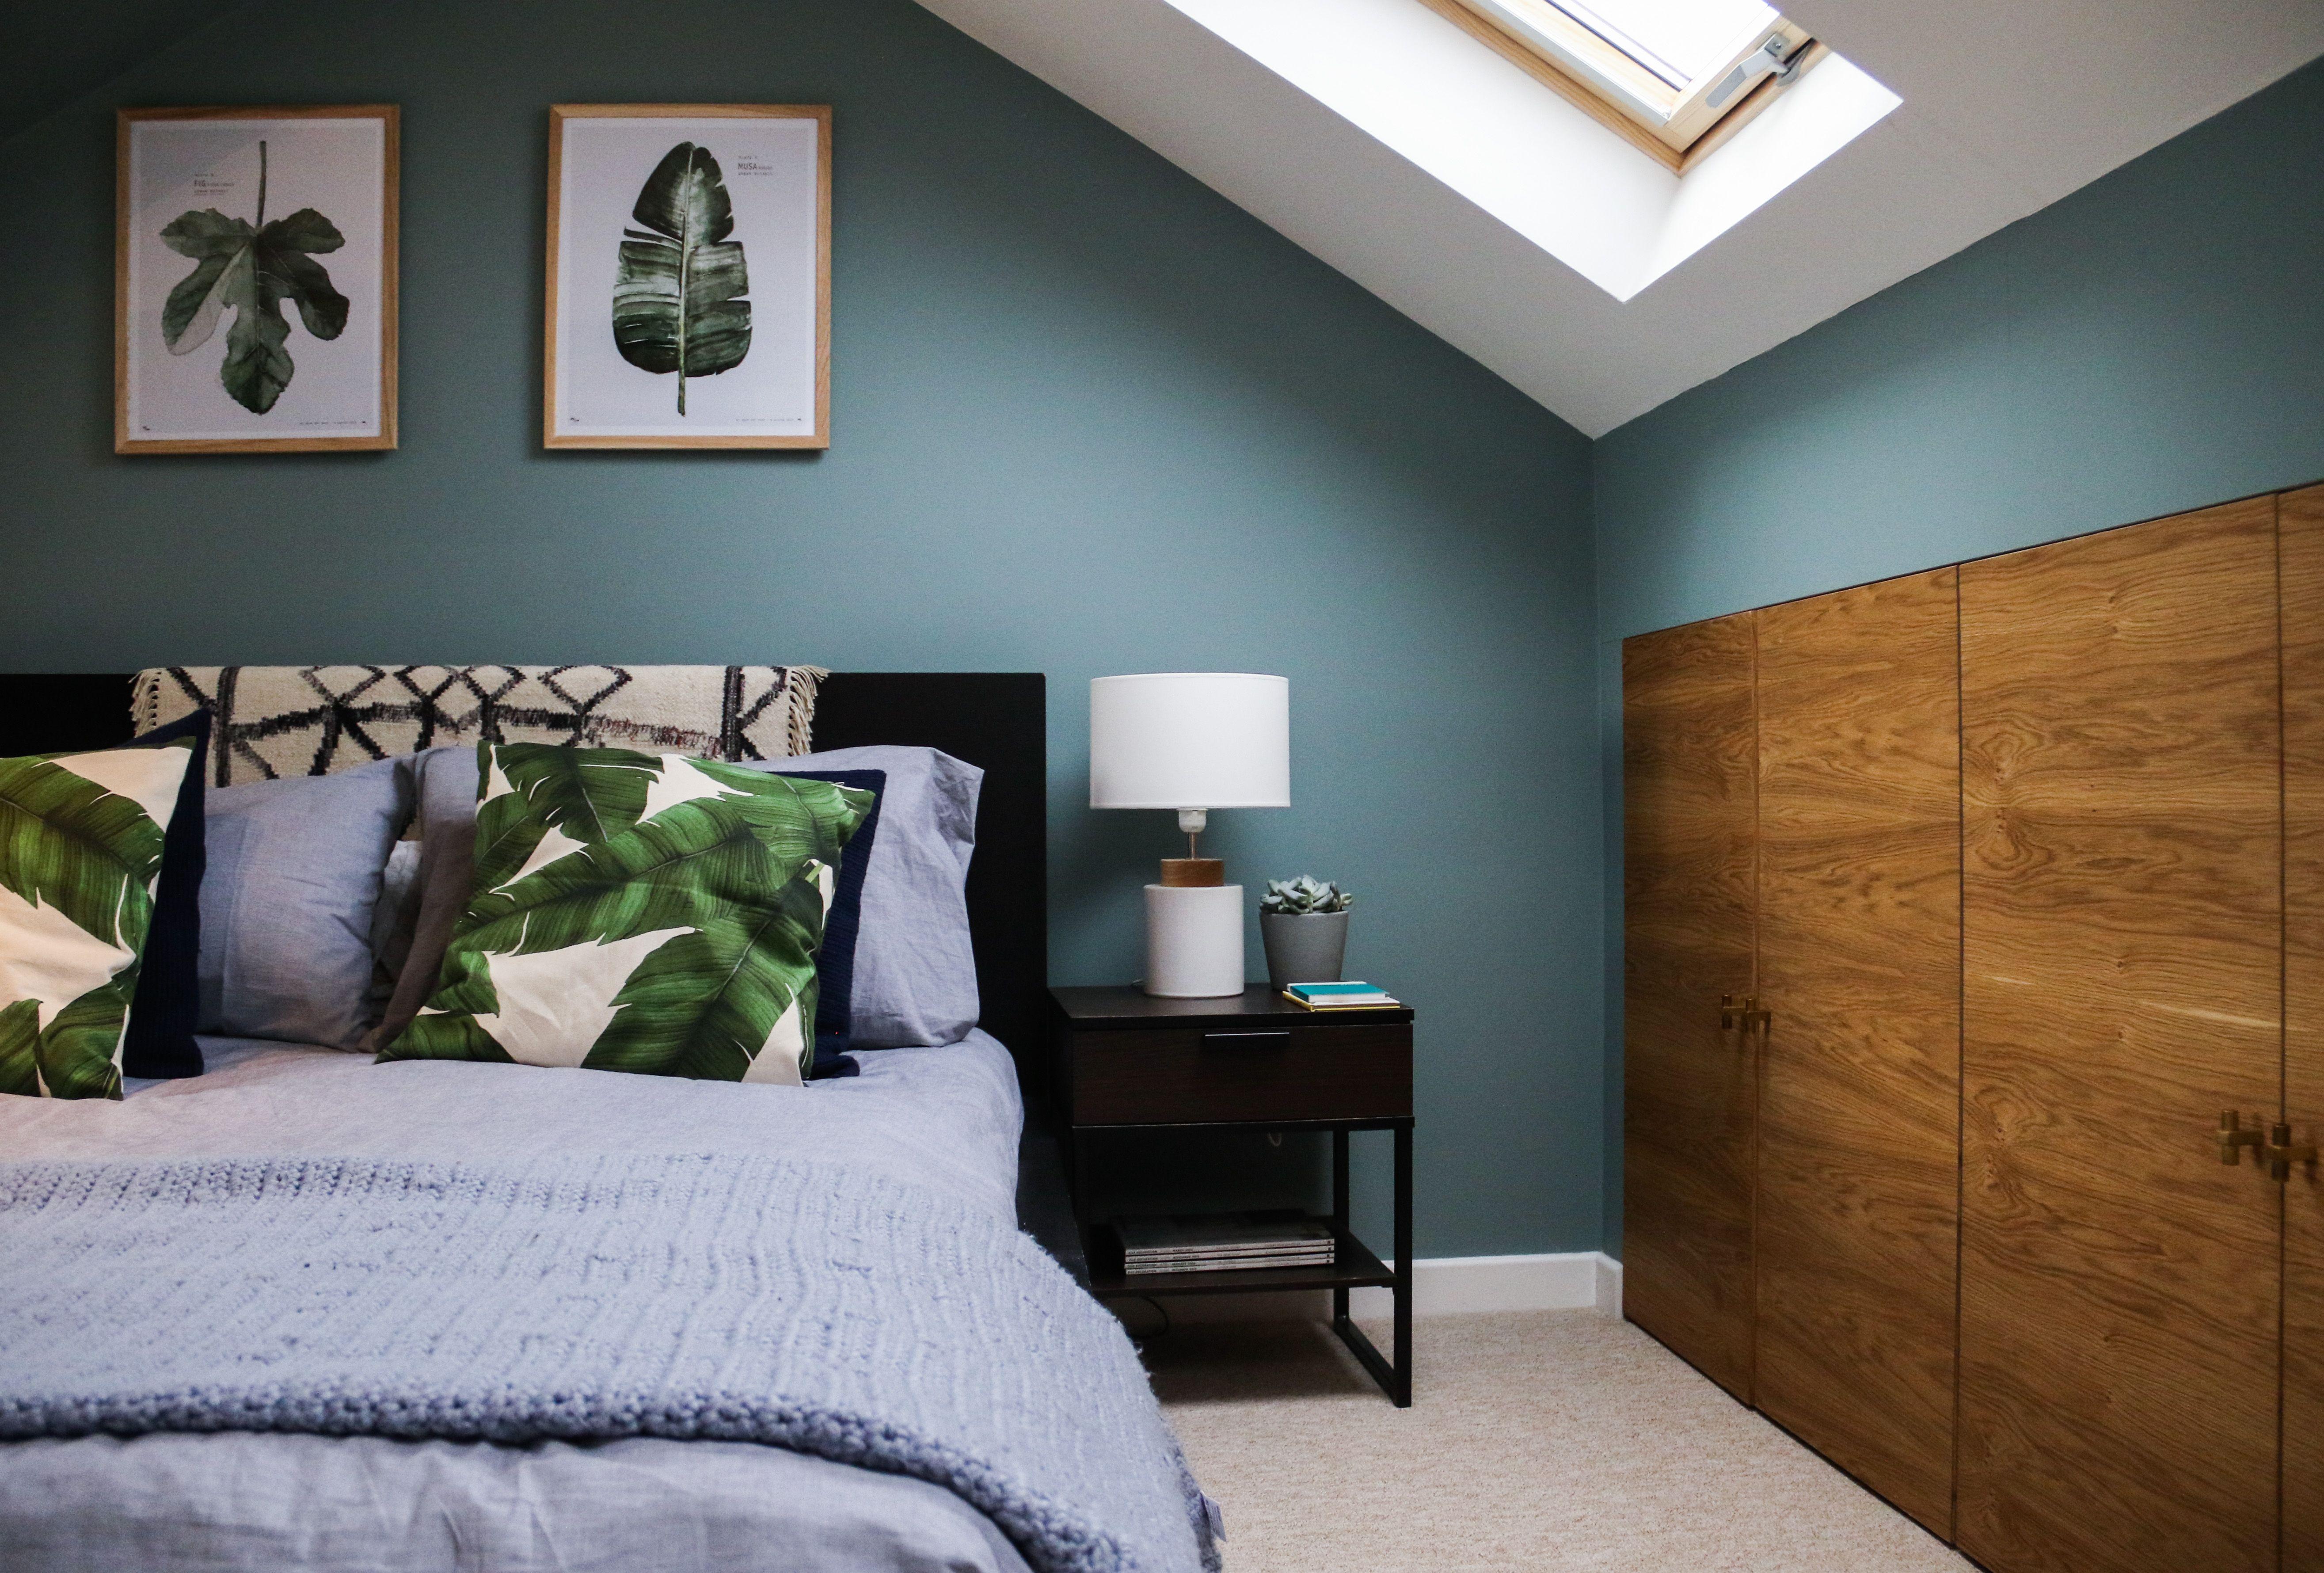 Loft bedroom images  Farrow u Ball Oval Room Blue palm leaves calming loft bedroom